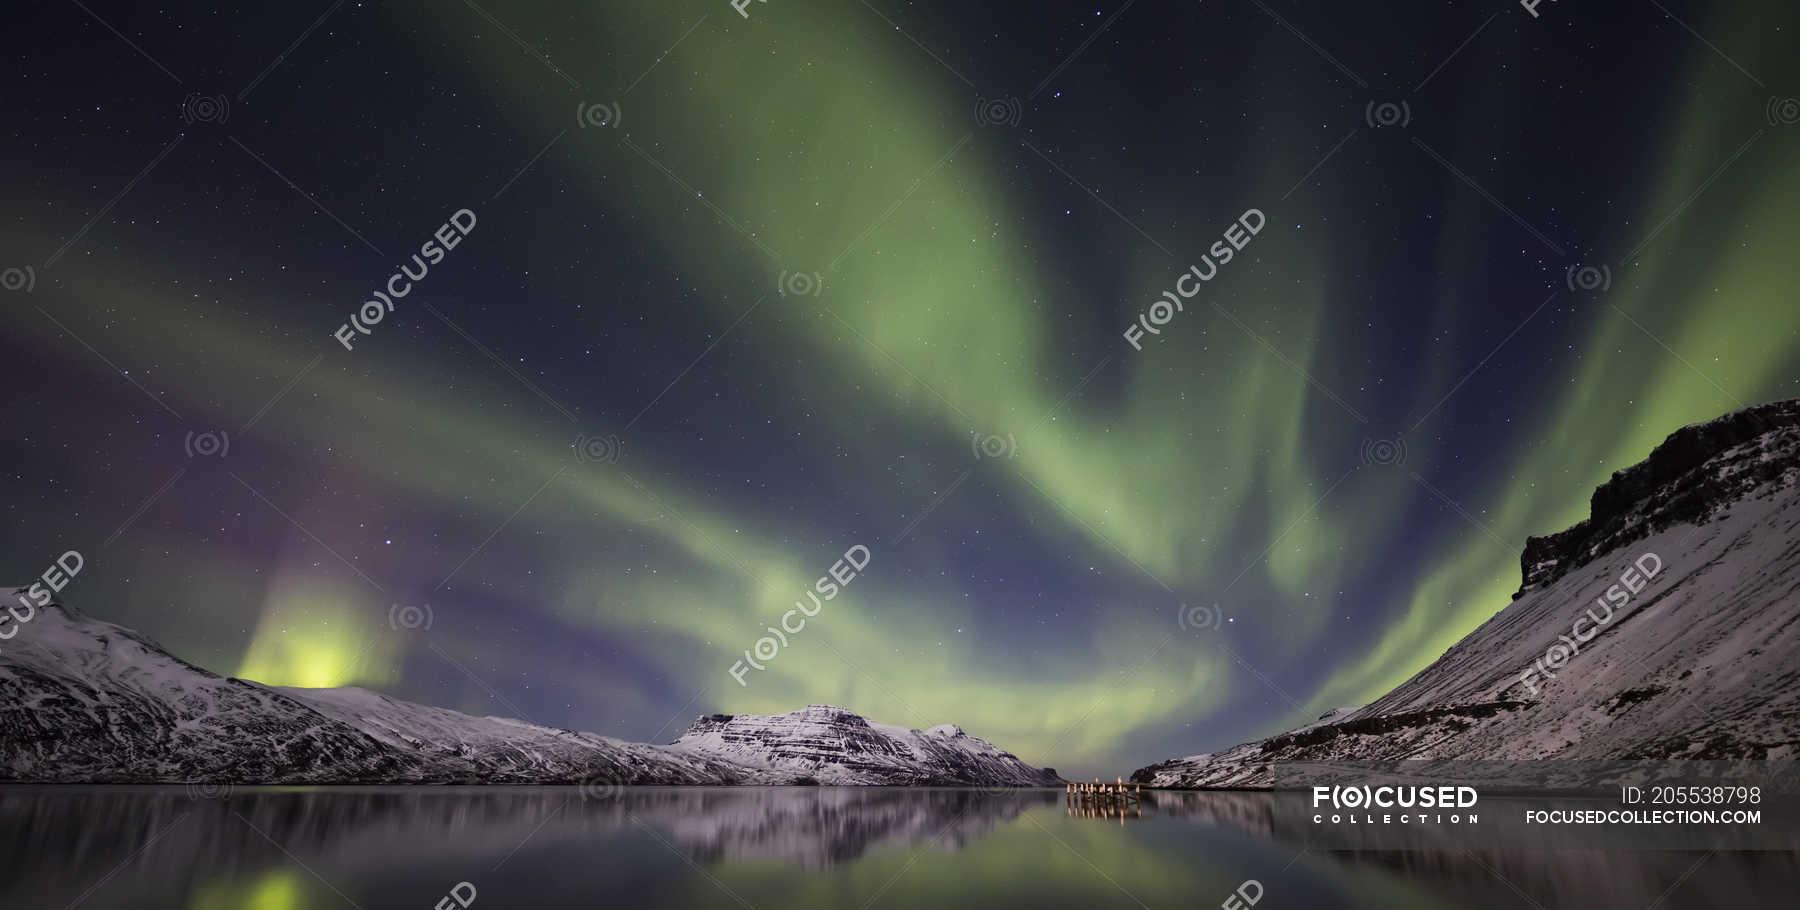 Aurora Borealis Or Northern Lights Djupavik West Fjords Iceland Coastal Travel Destination Stock Photo 205538798